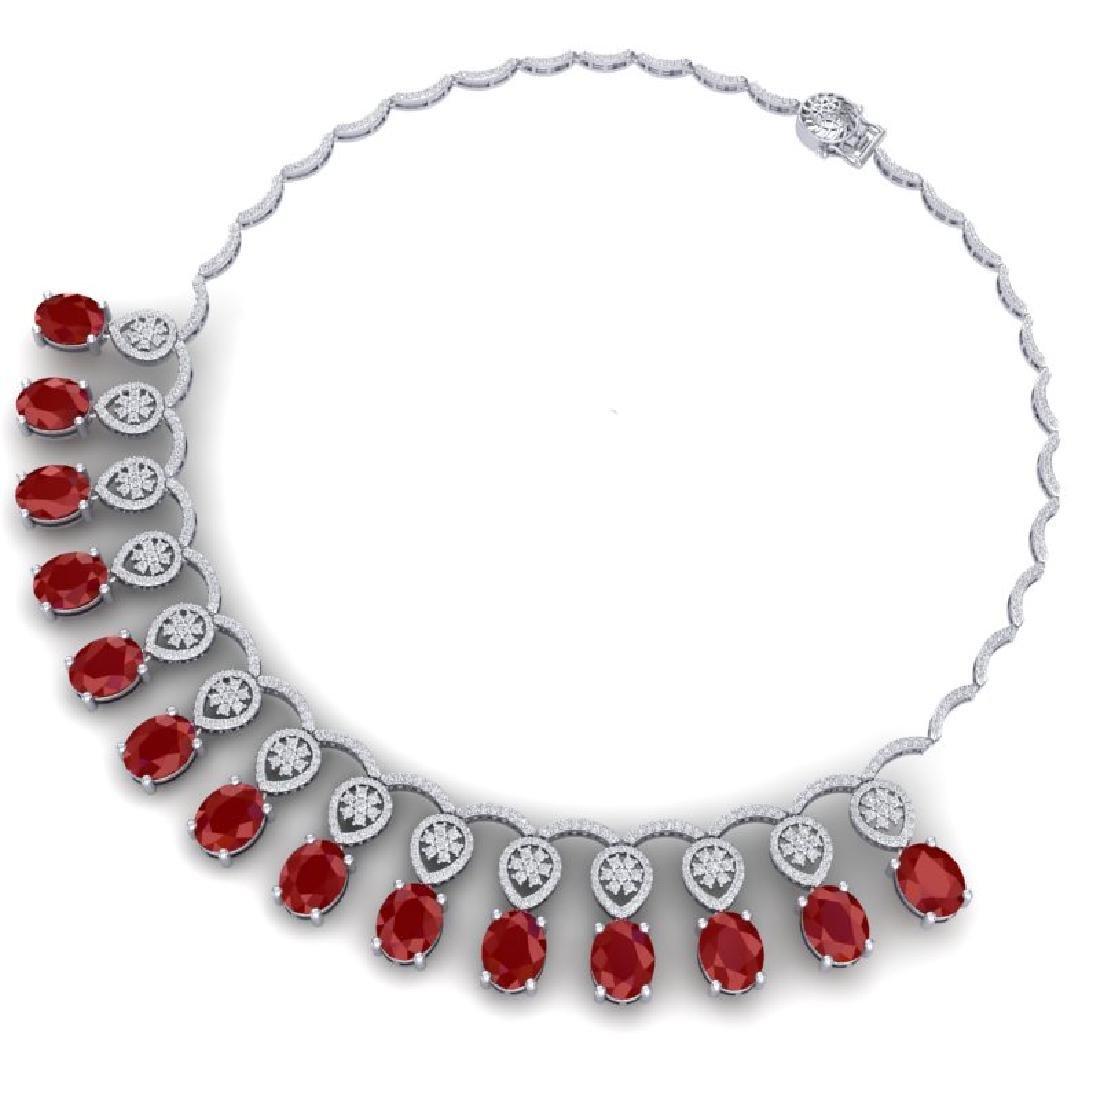 54.05 CTW Royalty Ruby & VS Diamond Necklace 18K White - 3